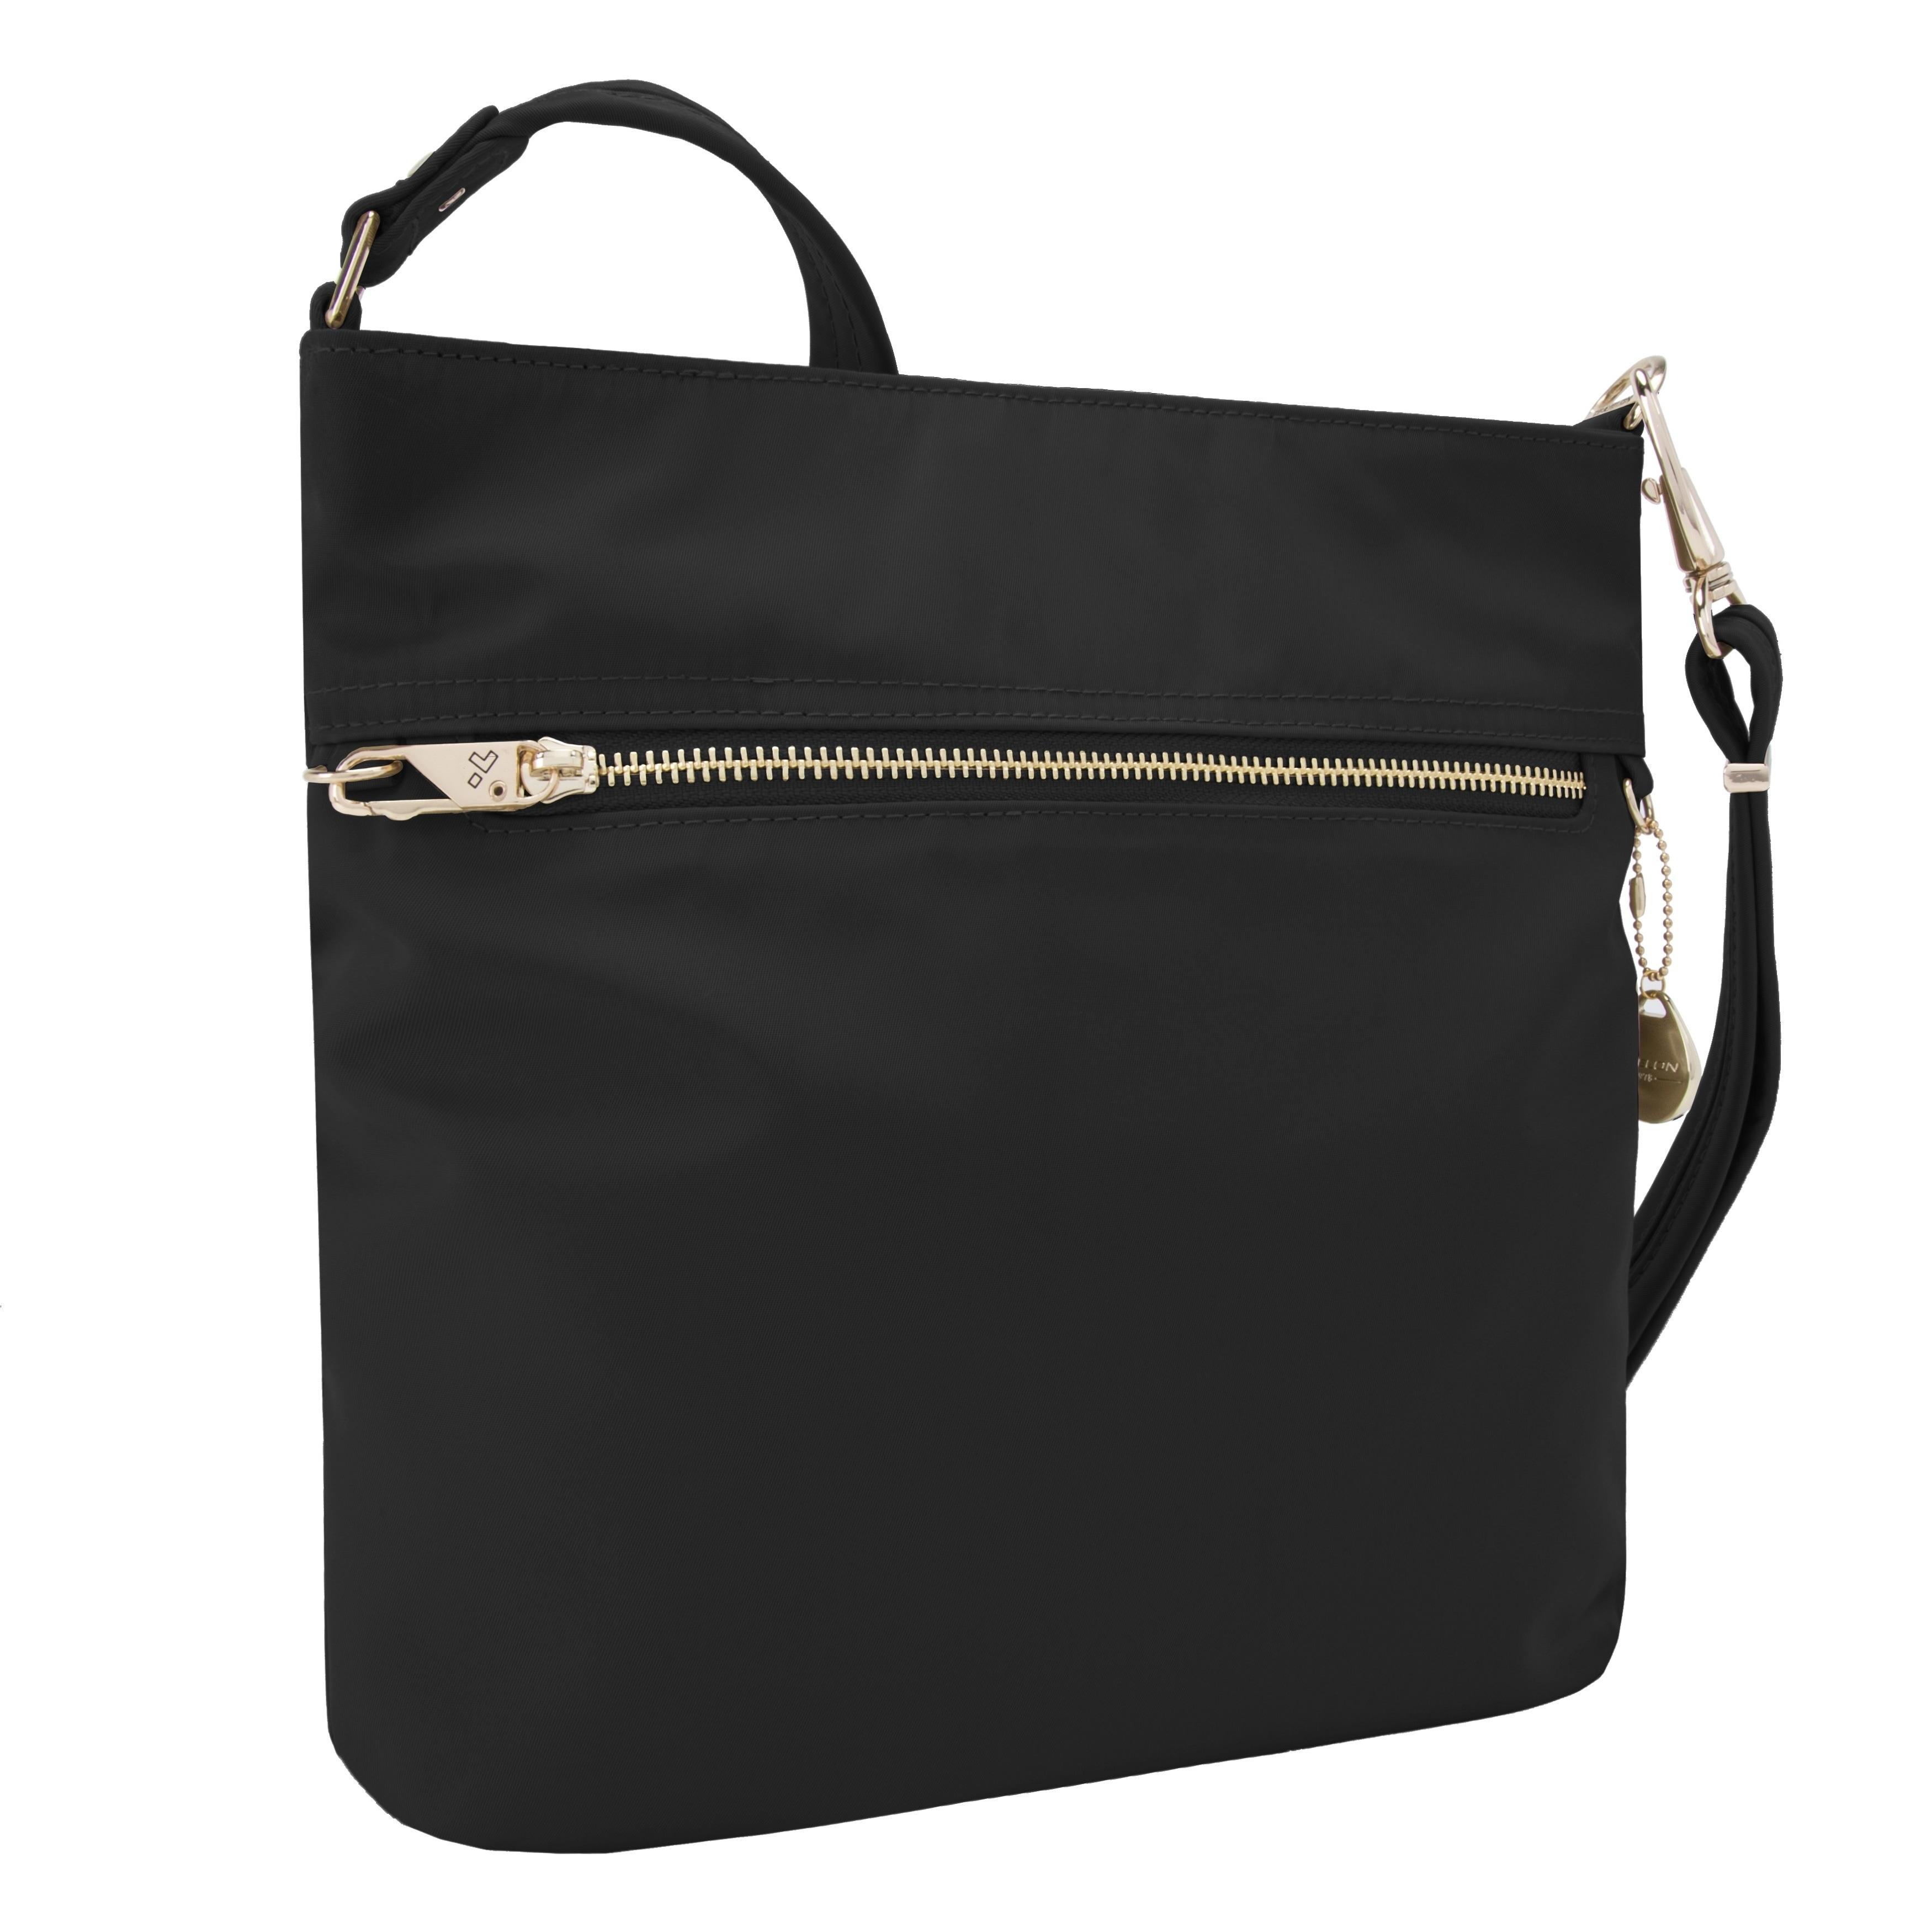 c54738c8c7e7 Buy Crossbody   Mini Bags Online at Overstock